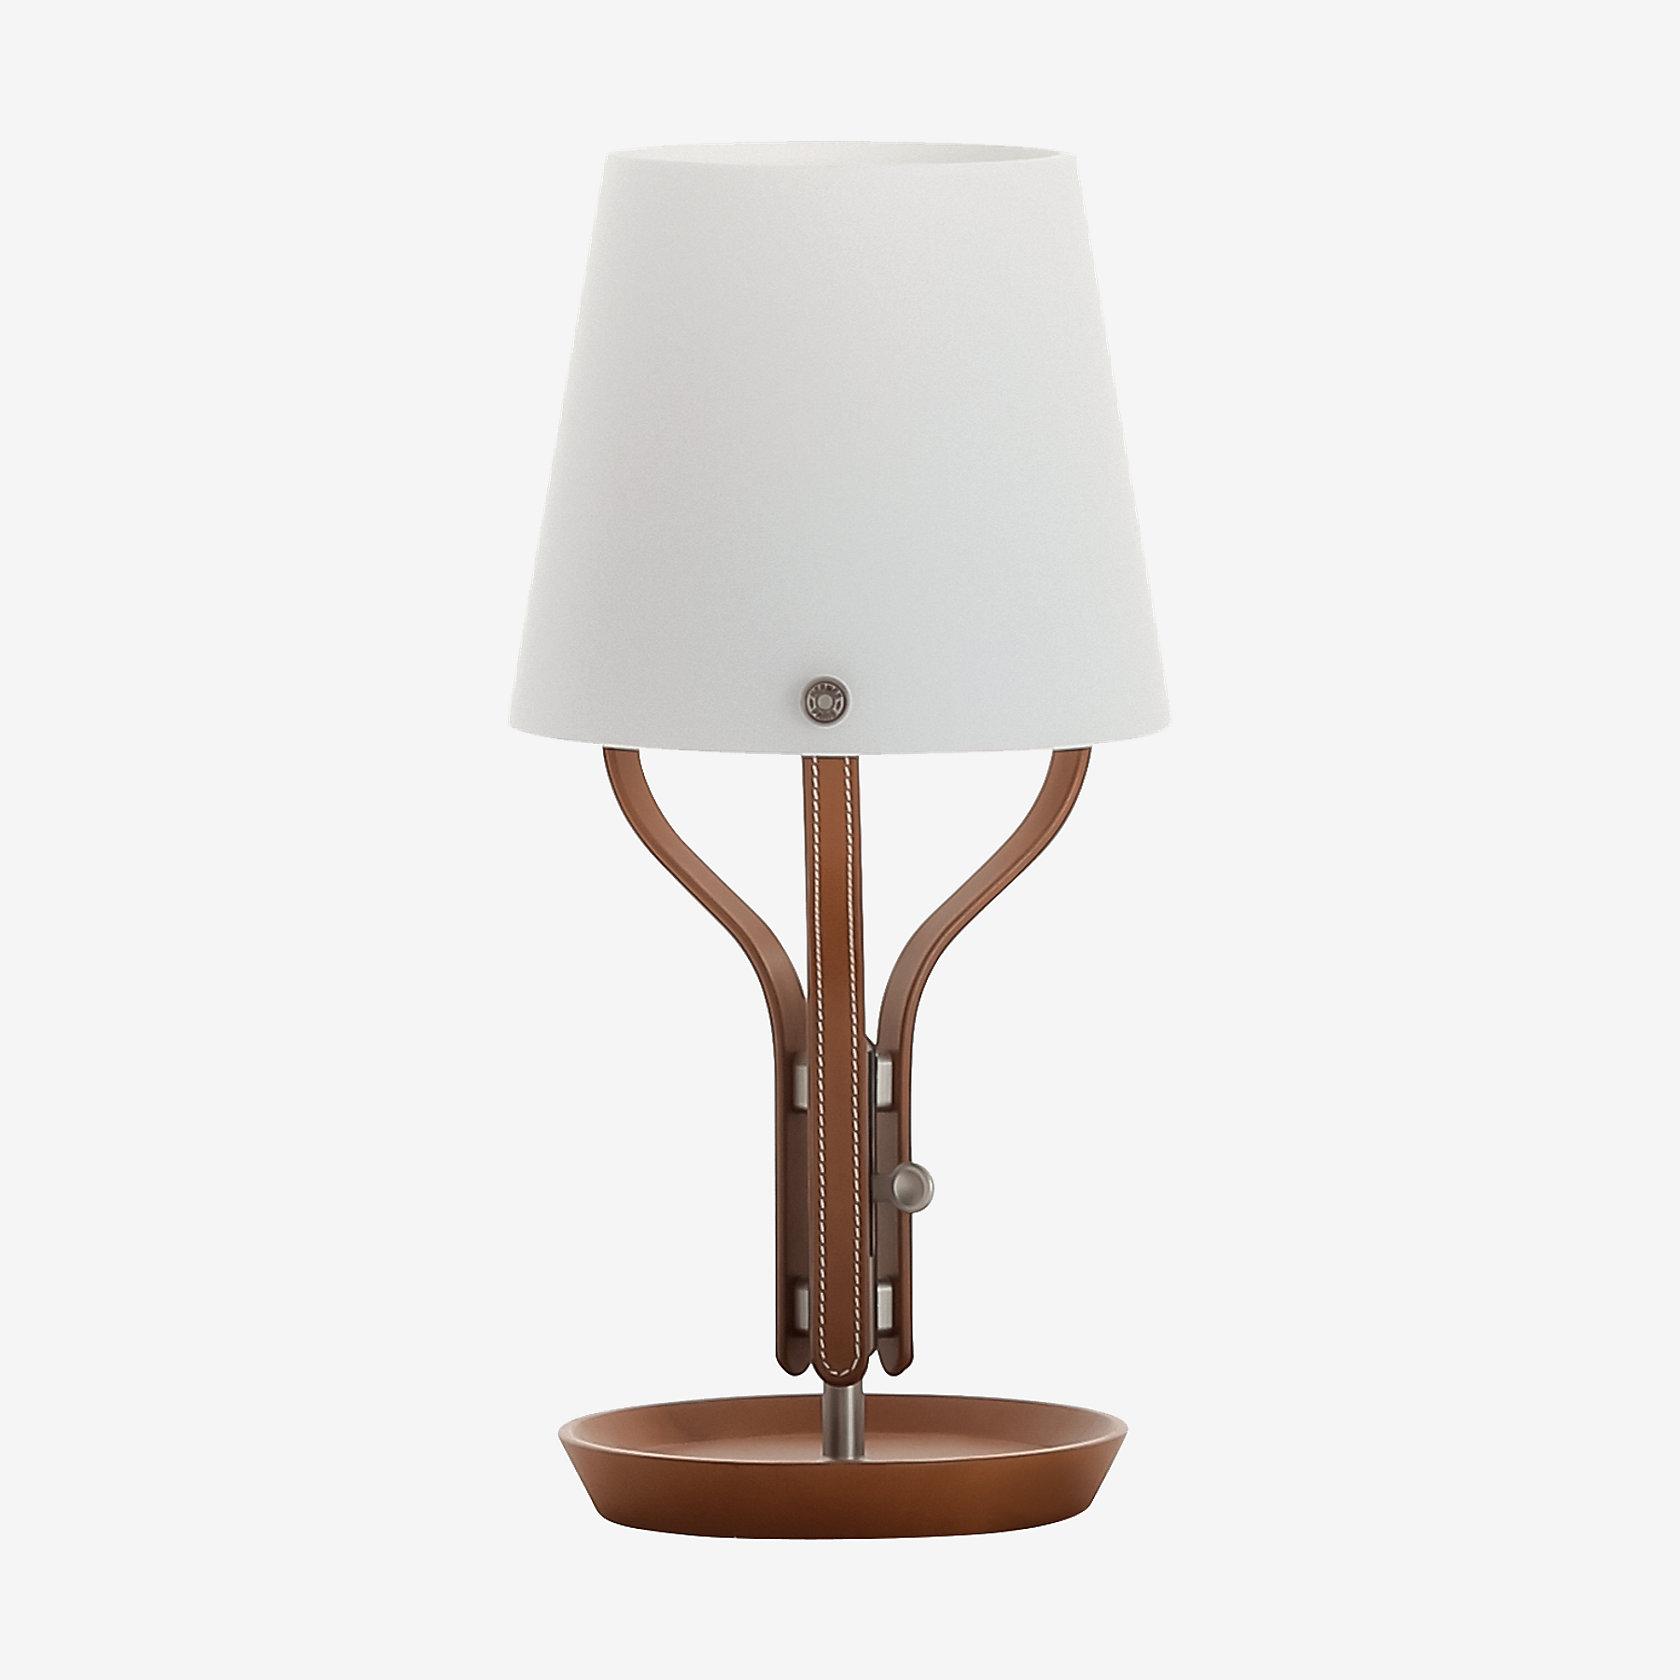 Design Bedside Lamp harnais universal bedside lamp lamp